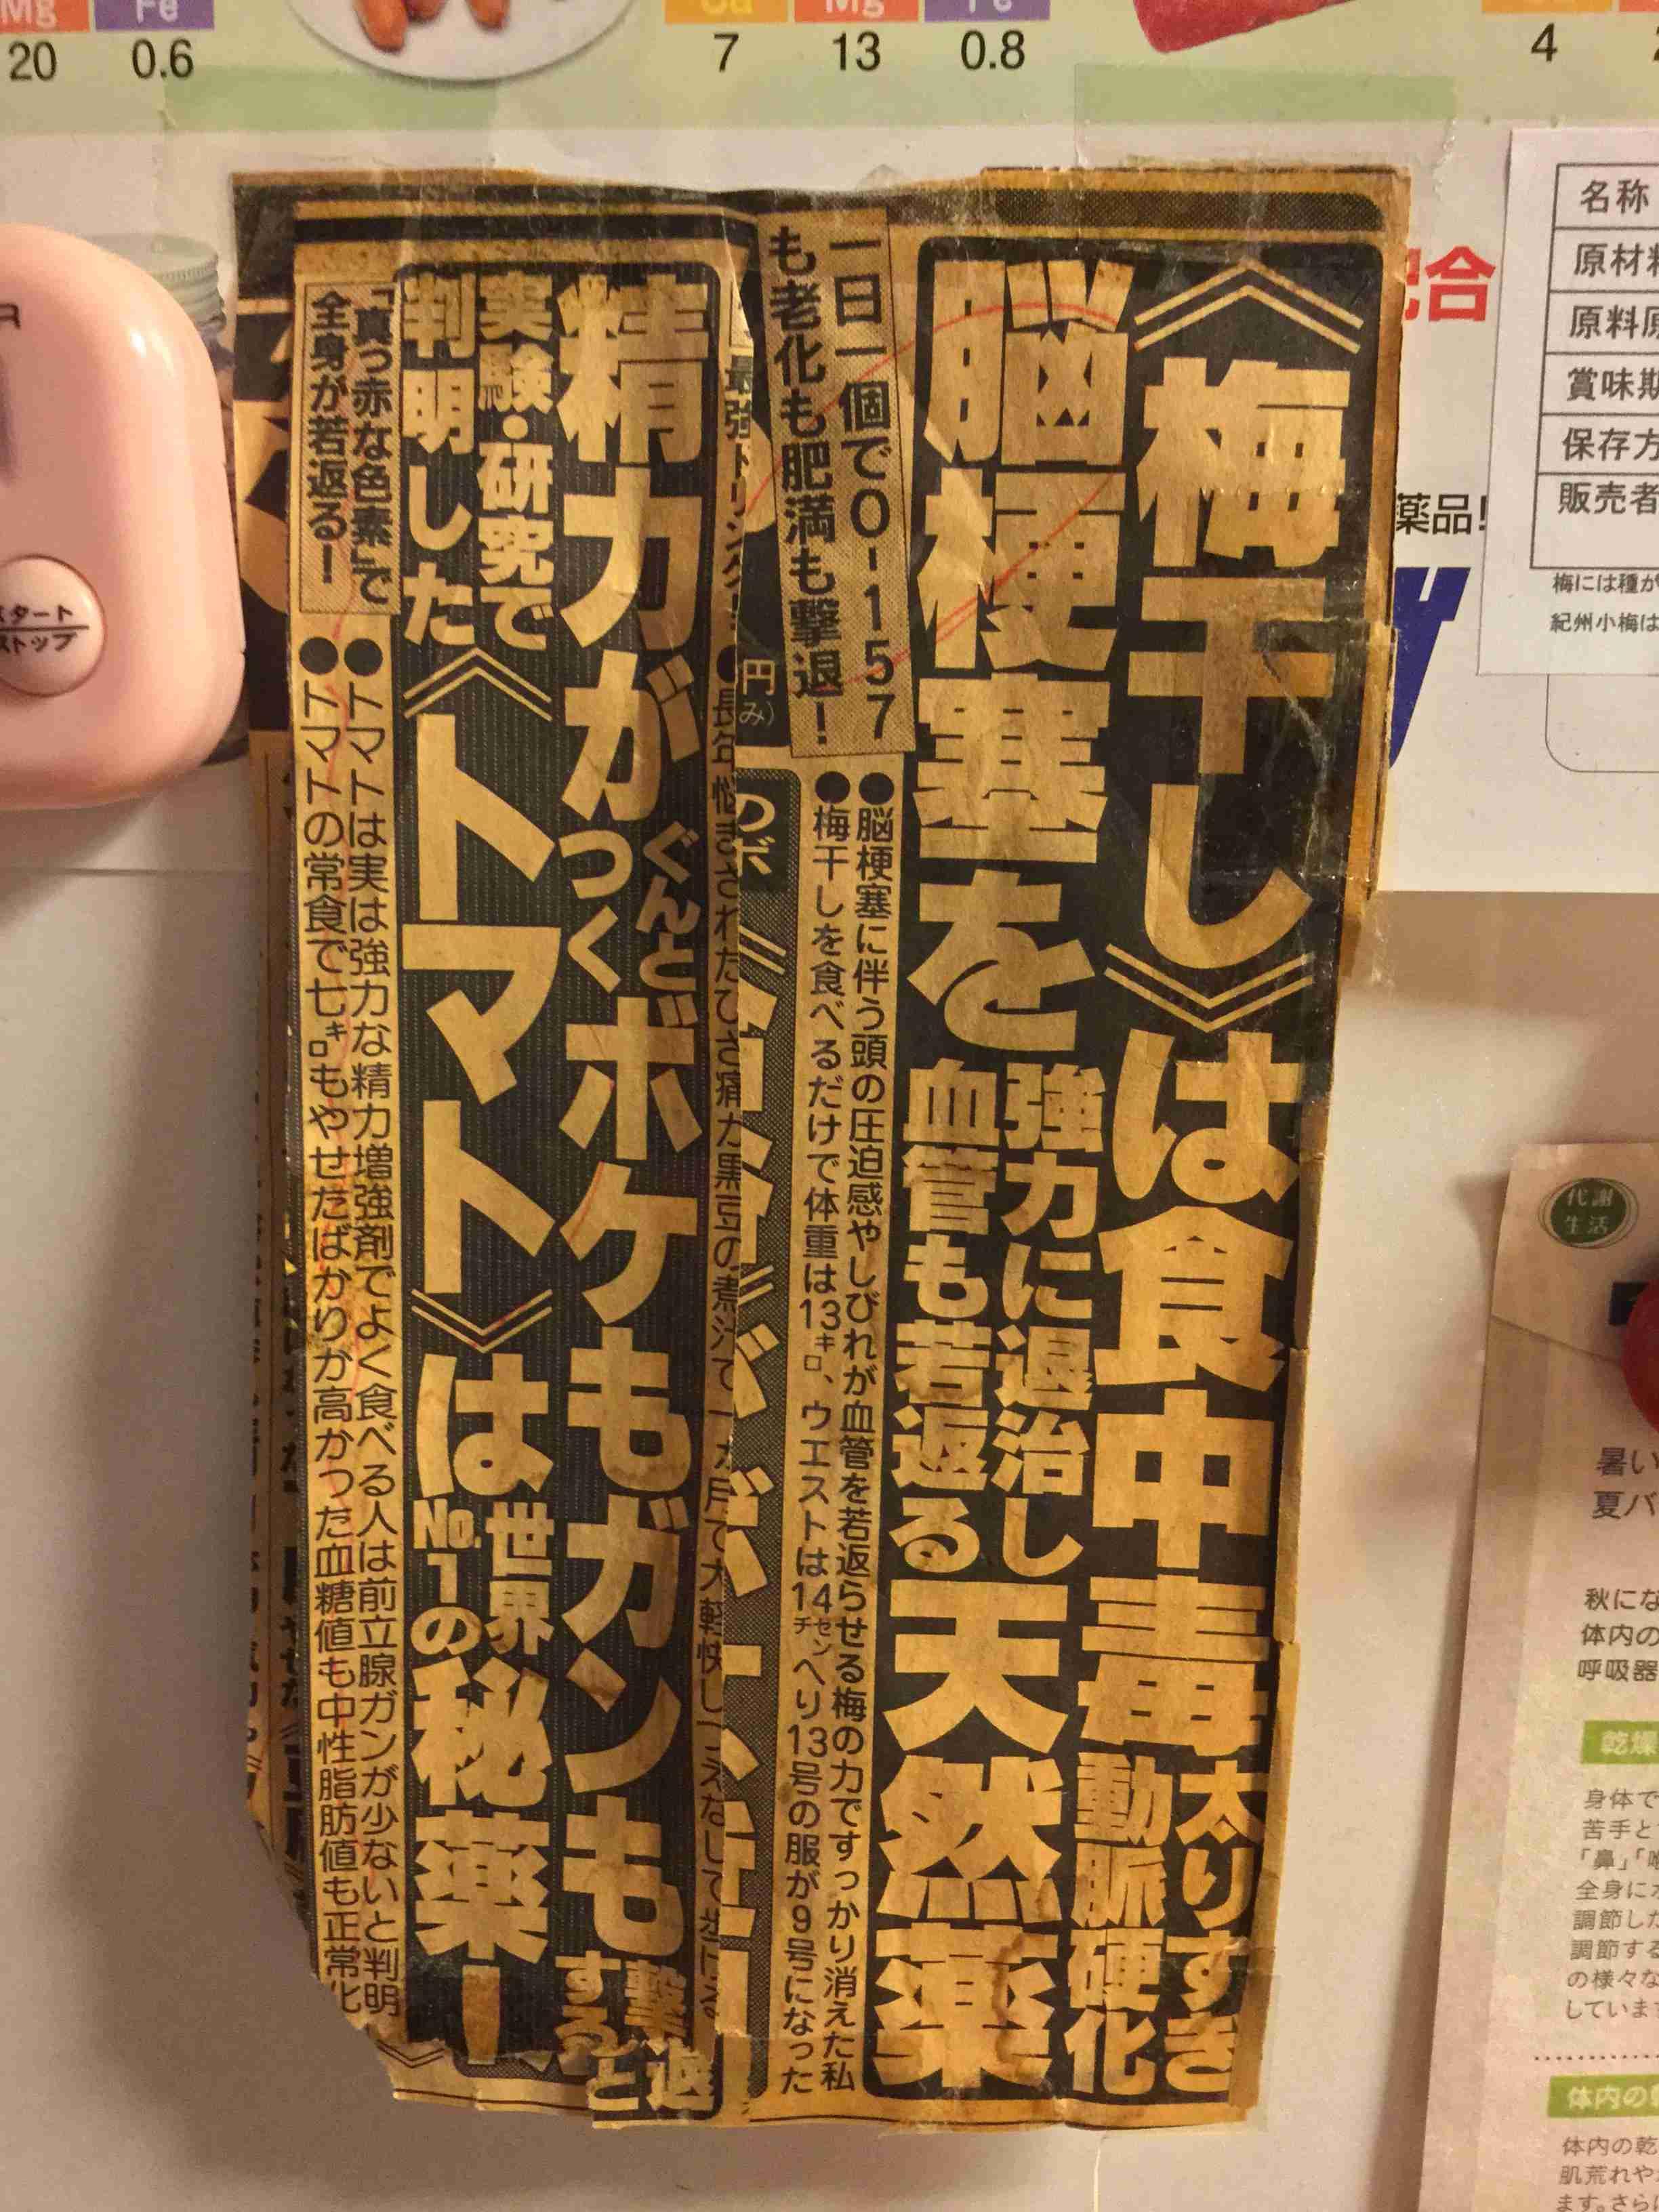 O157で5歳女児重体、2人重症 埼玉・熊谷のスーパー販売のポテトサラダ食べる